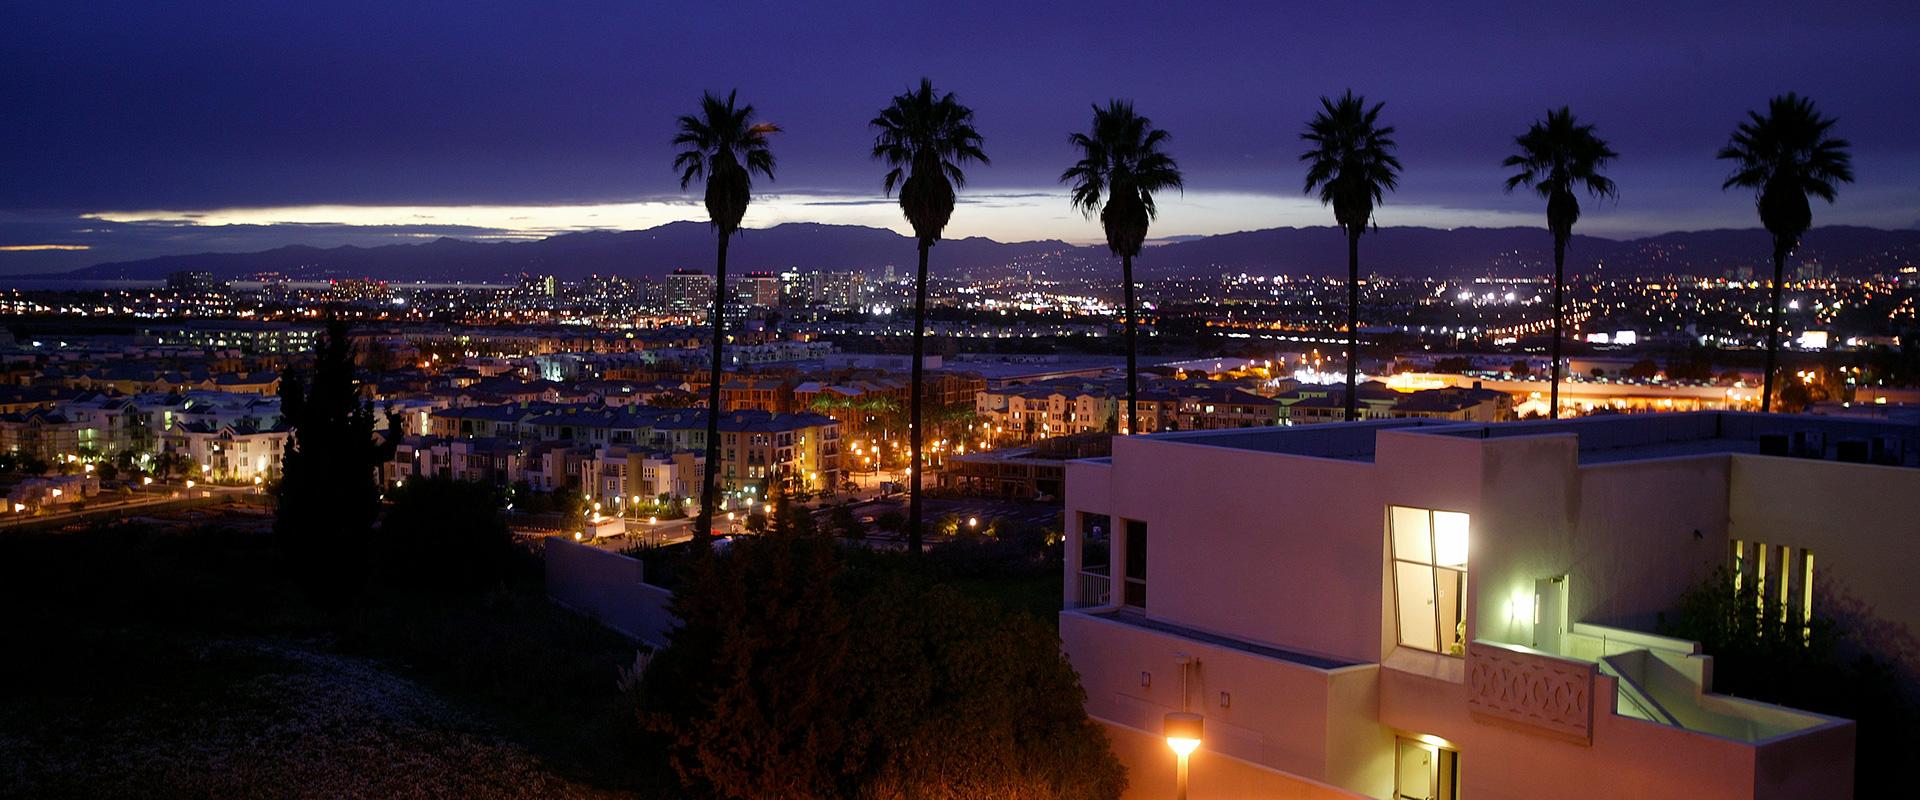 Los Angeles City Student Jobs